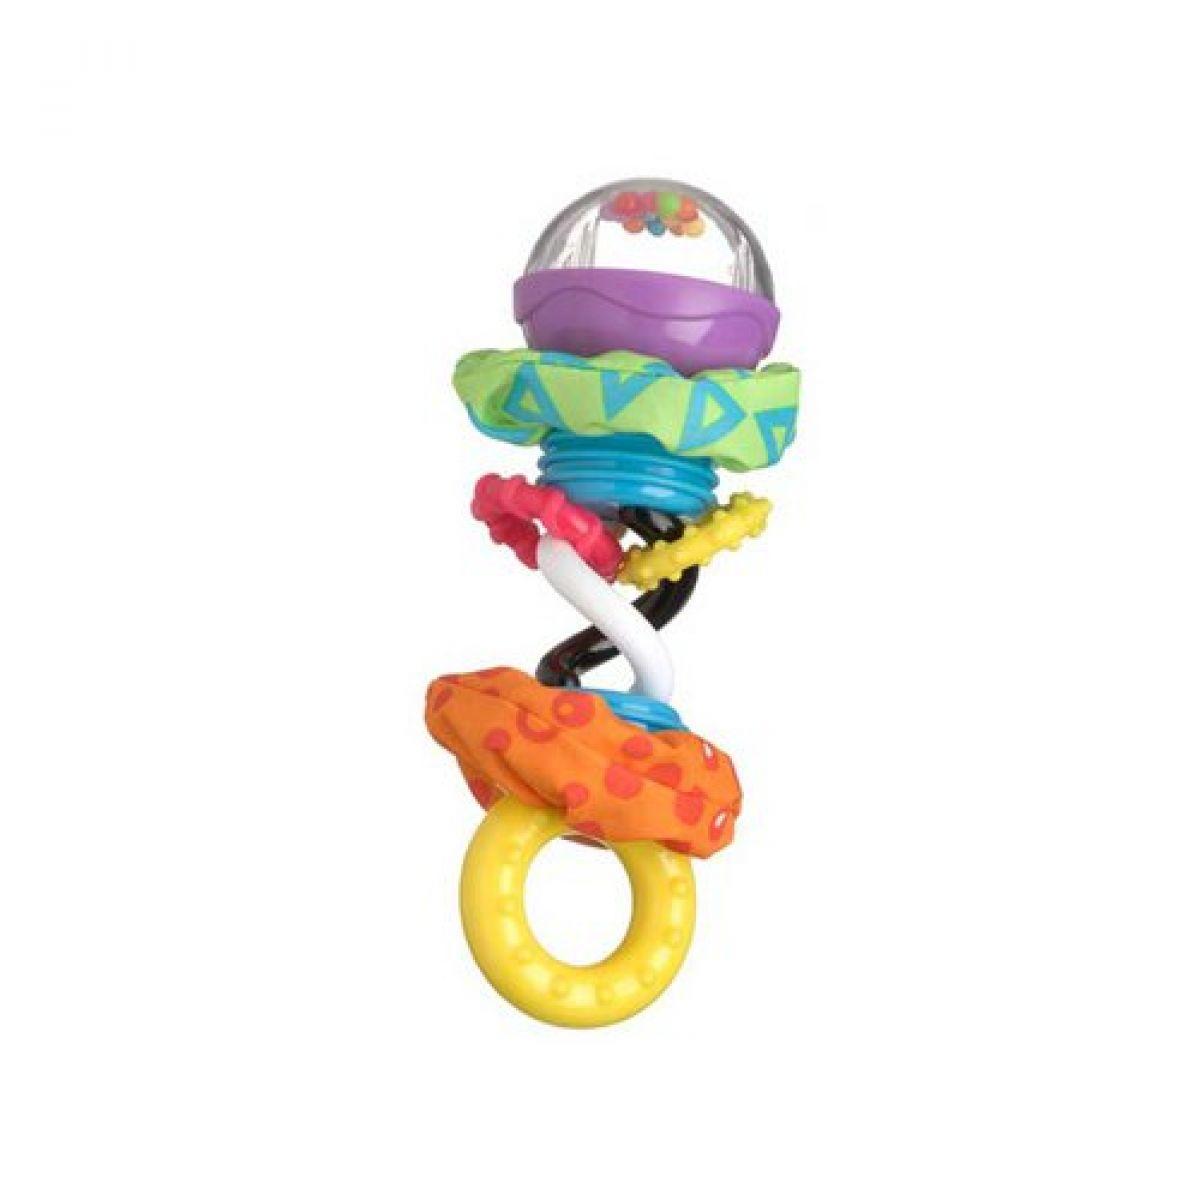 Playgro 0181598 Kroucené hrkálka s kuličkami